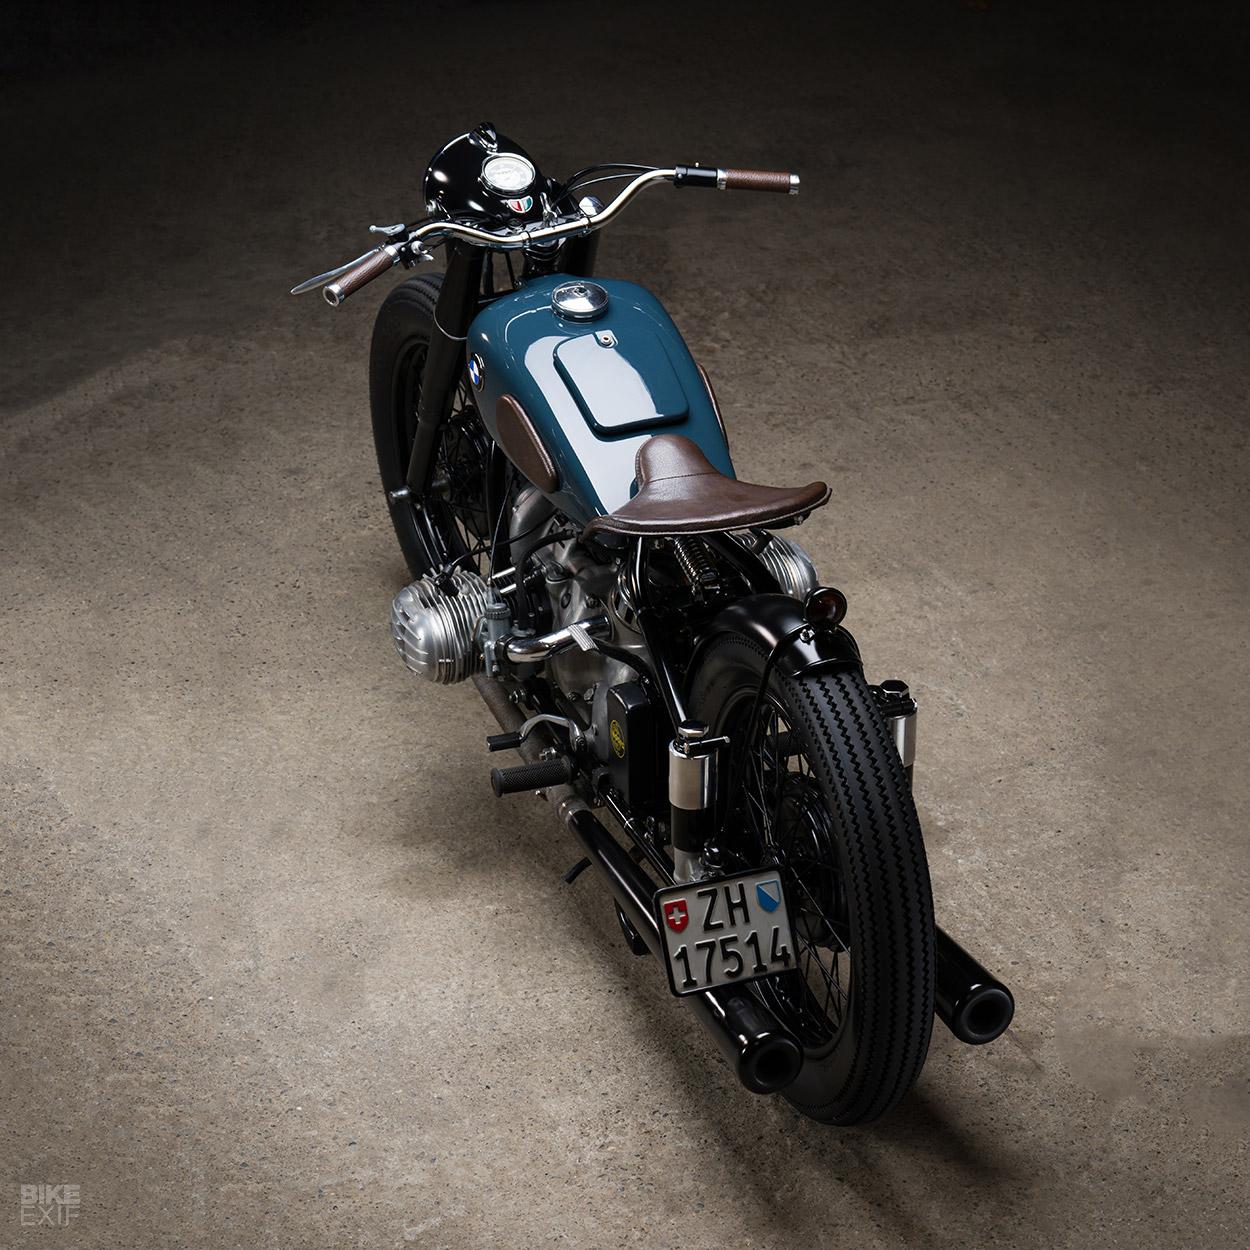 Old Timer This Swiss Bmw Restomod Is Just Perfekt Bike Exif R60 2 Wiring Harness Full Size